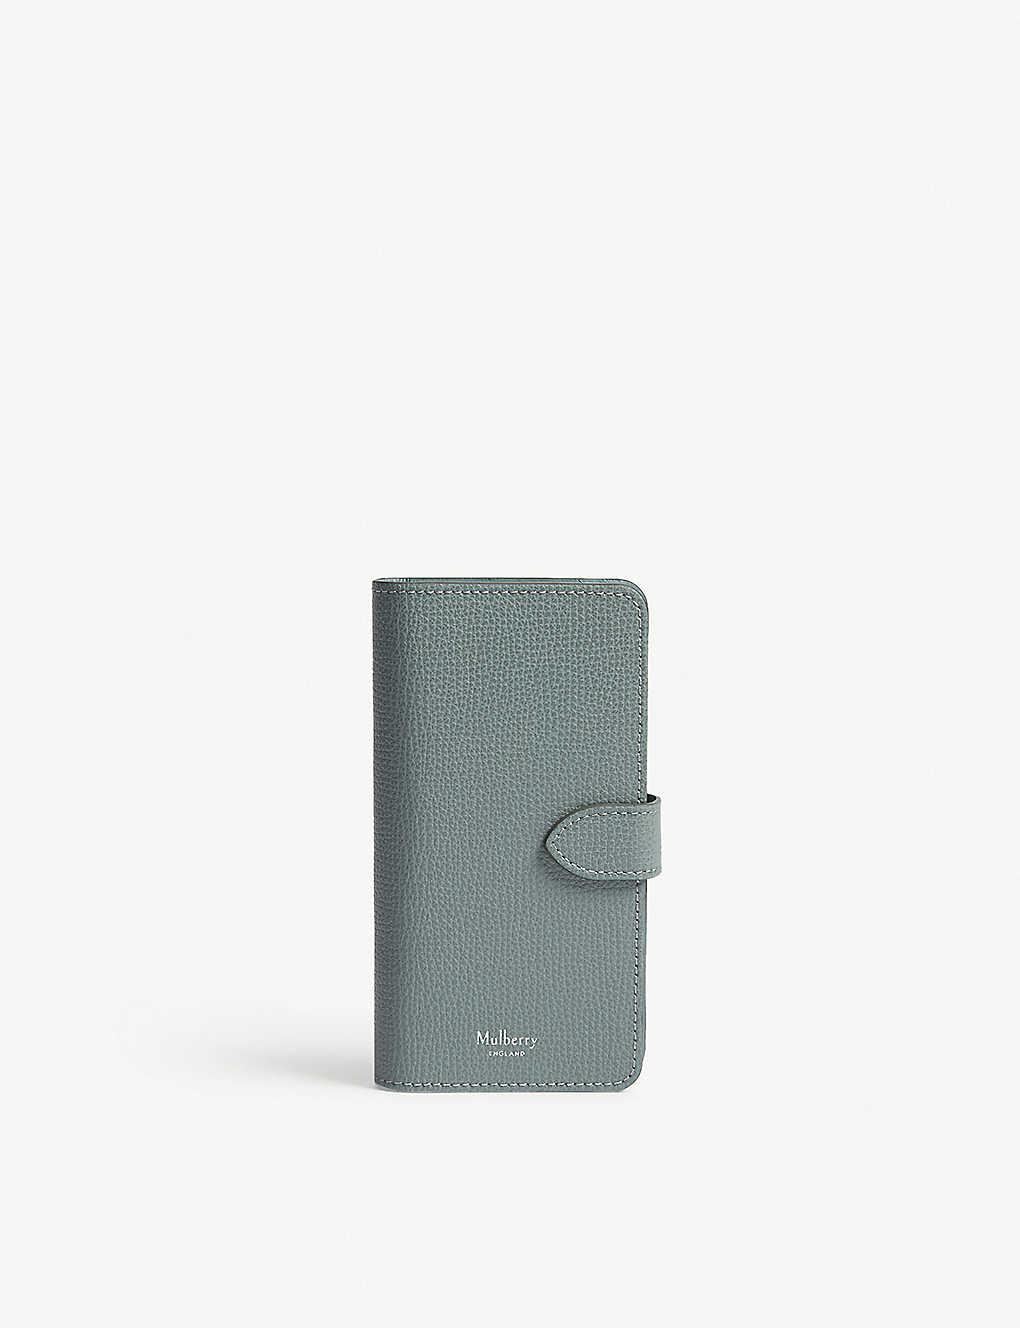 official photos 036b5 983b8 MULBERRY - iPhone 6/7 leather flip case | Selfridges.com